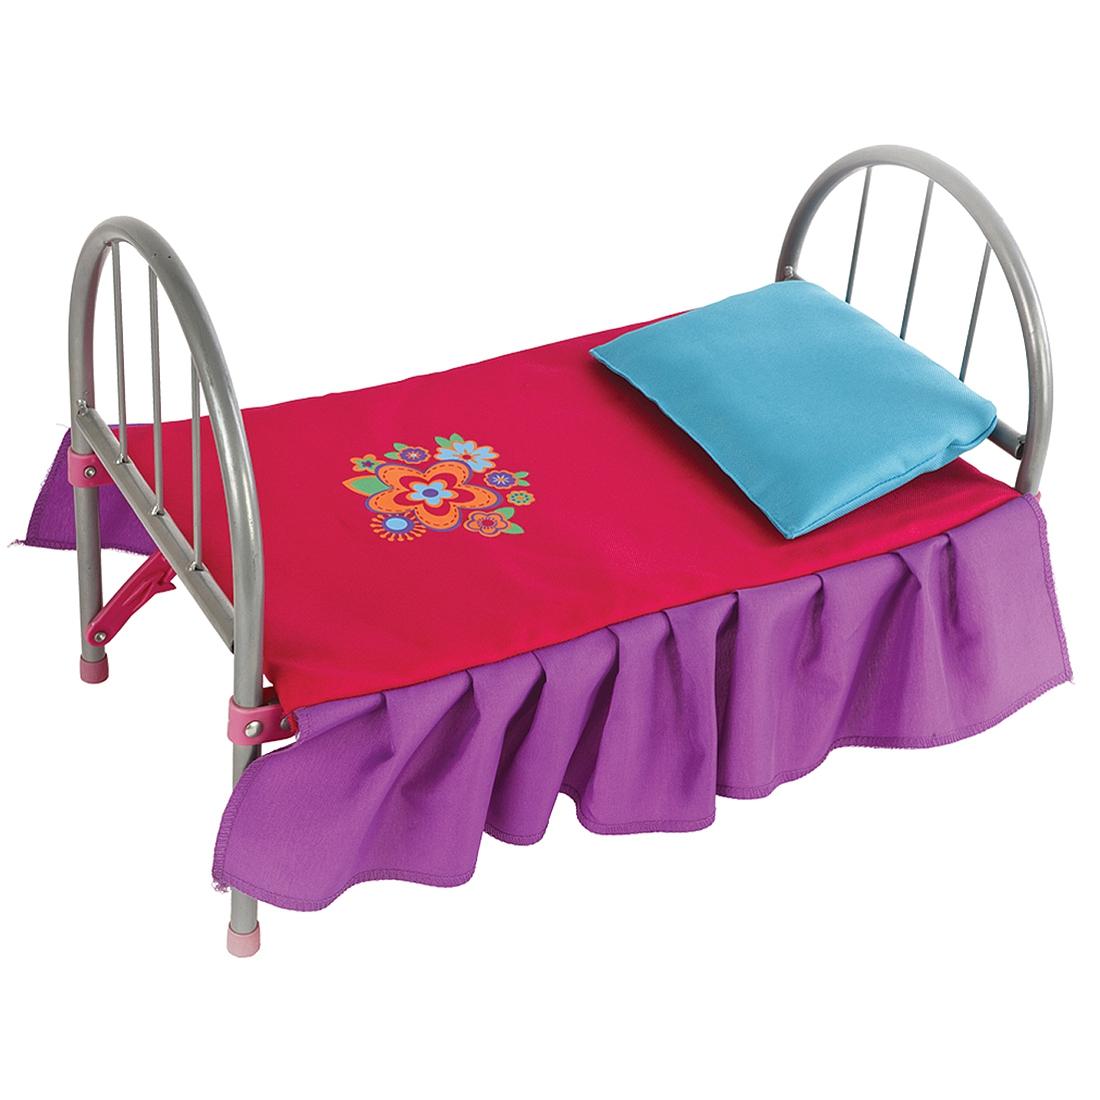 Аксессуары Mary Poppins Кроватка для куклы Цветочек металлическая